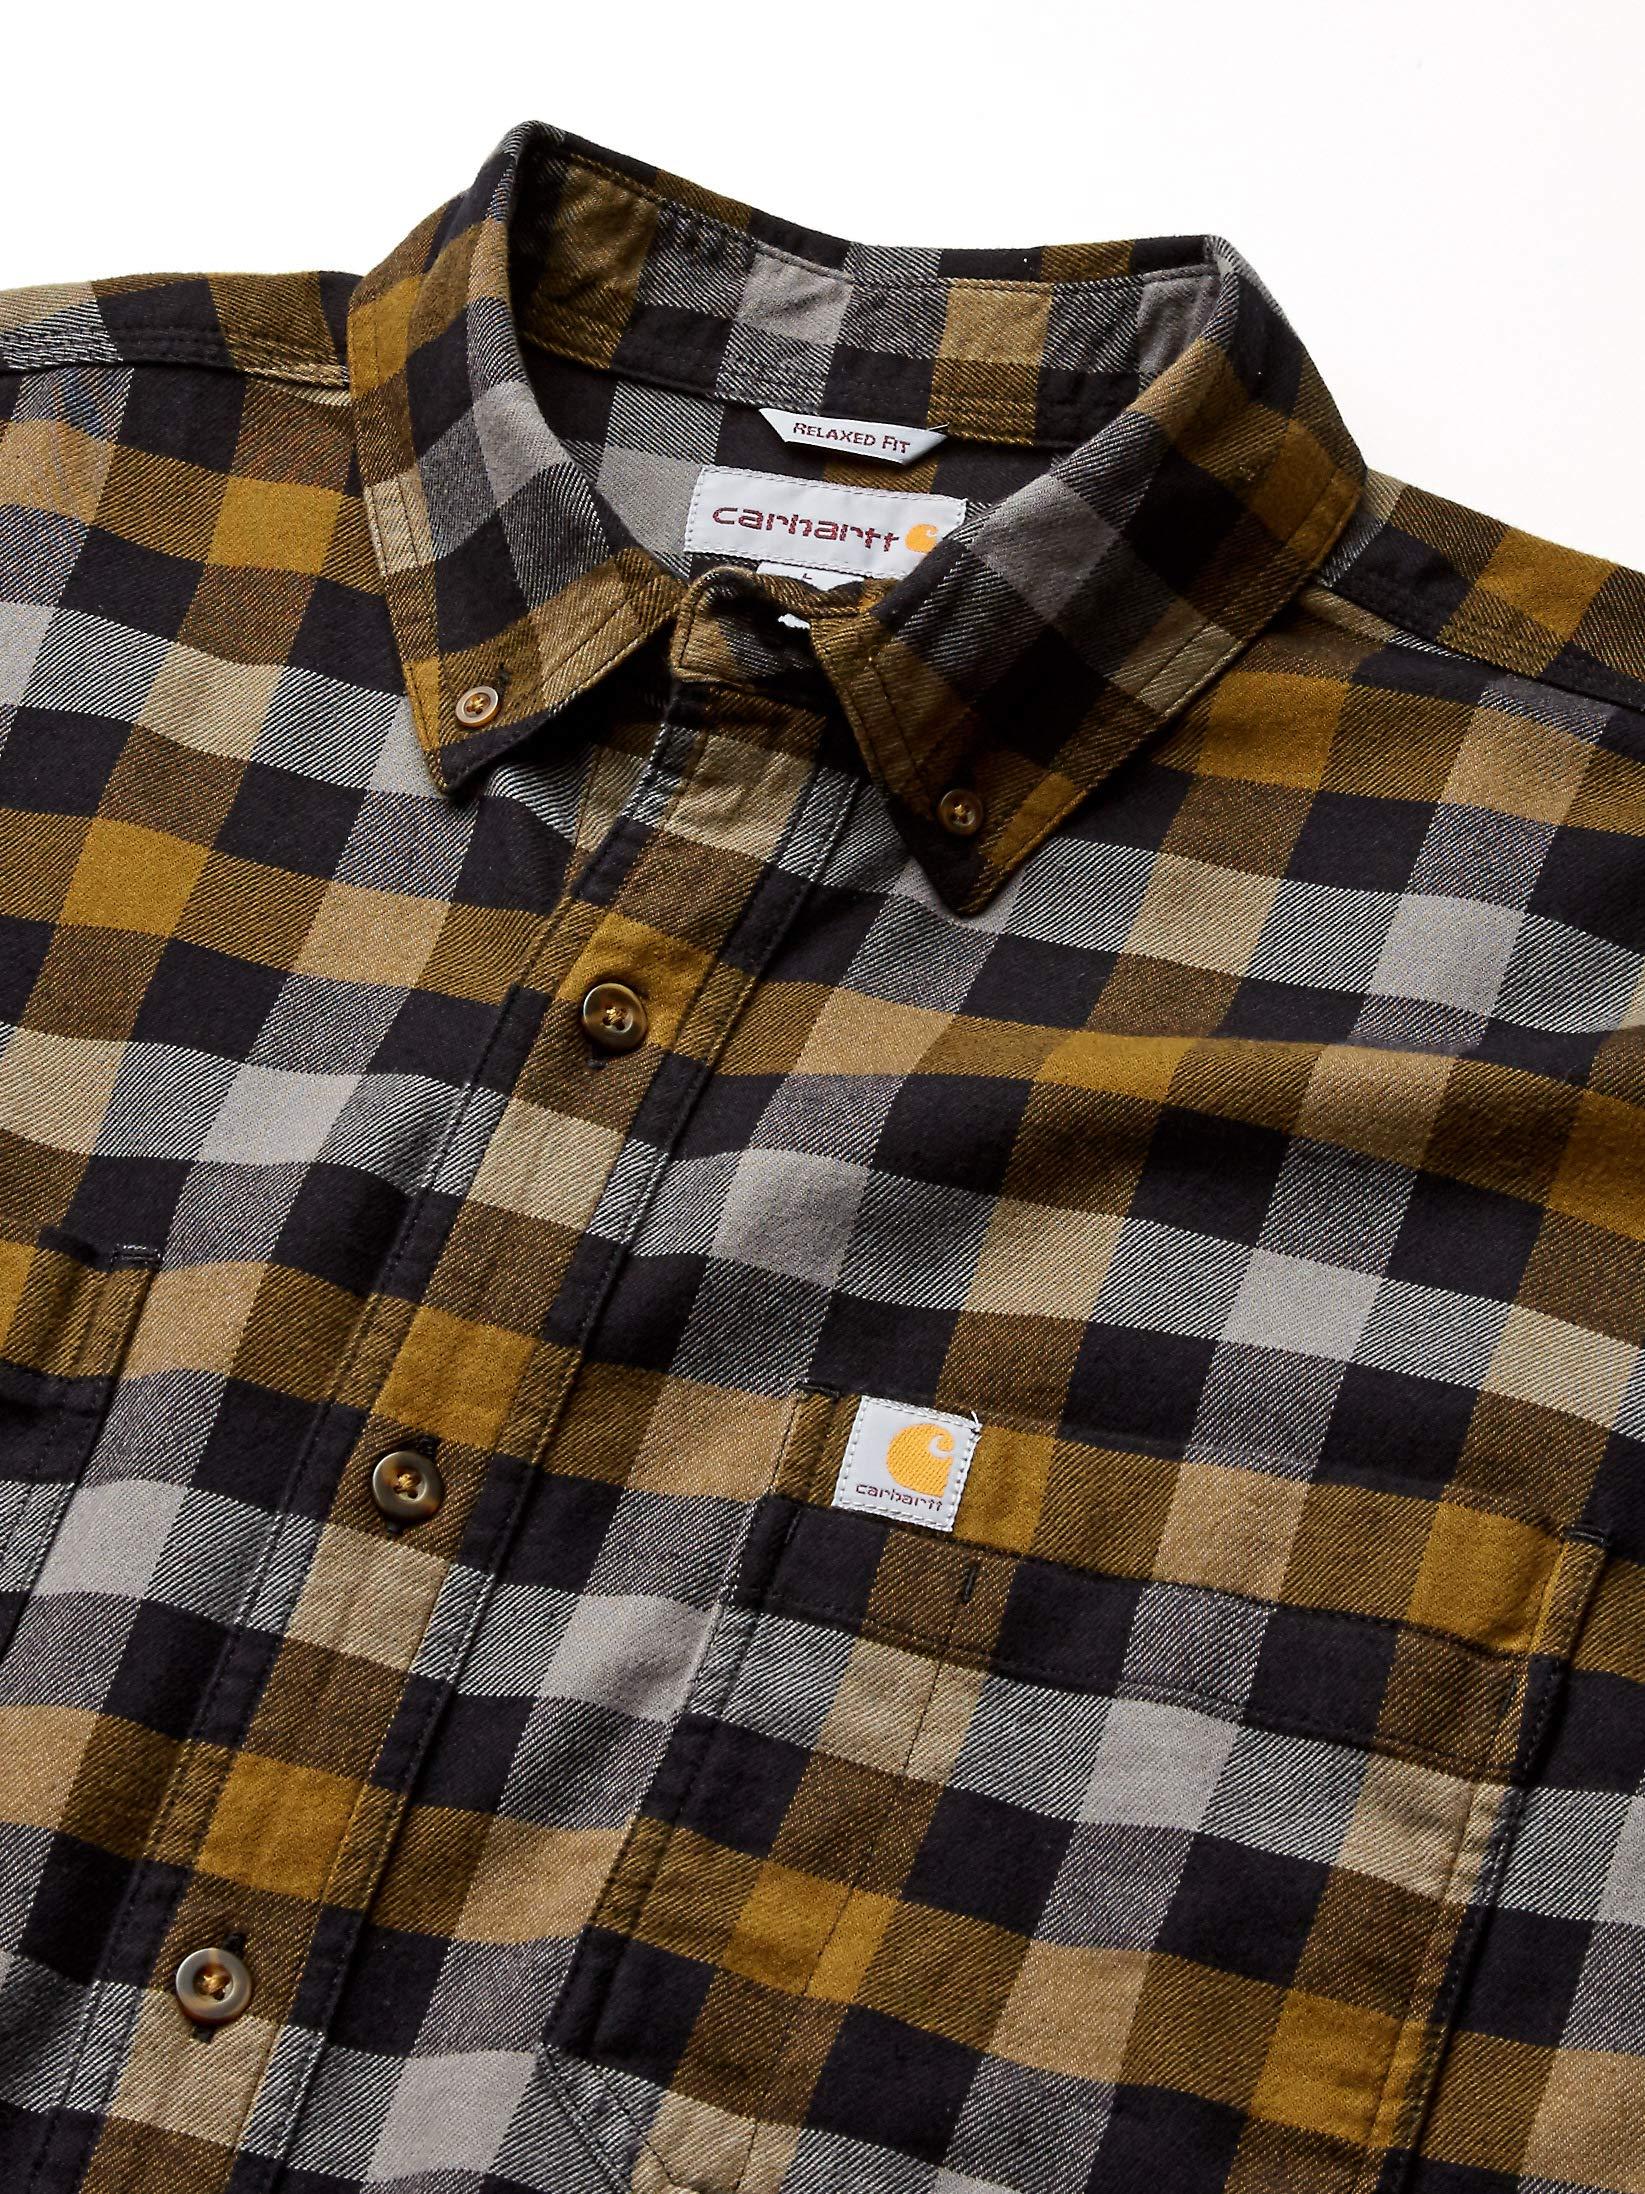 Black 001 Carhartt 103314C Rugged Flex Hamilton Plaid Flannel Shirt